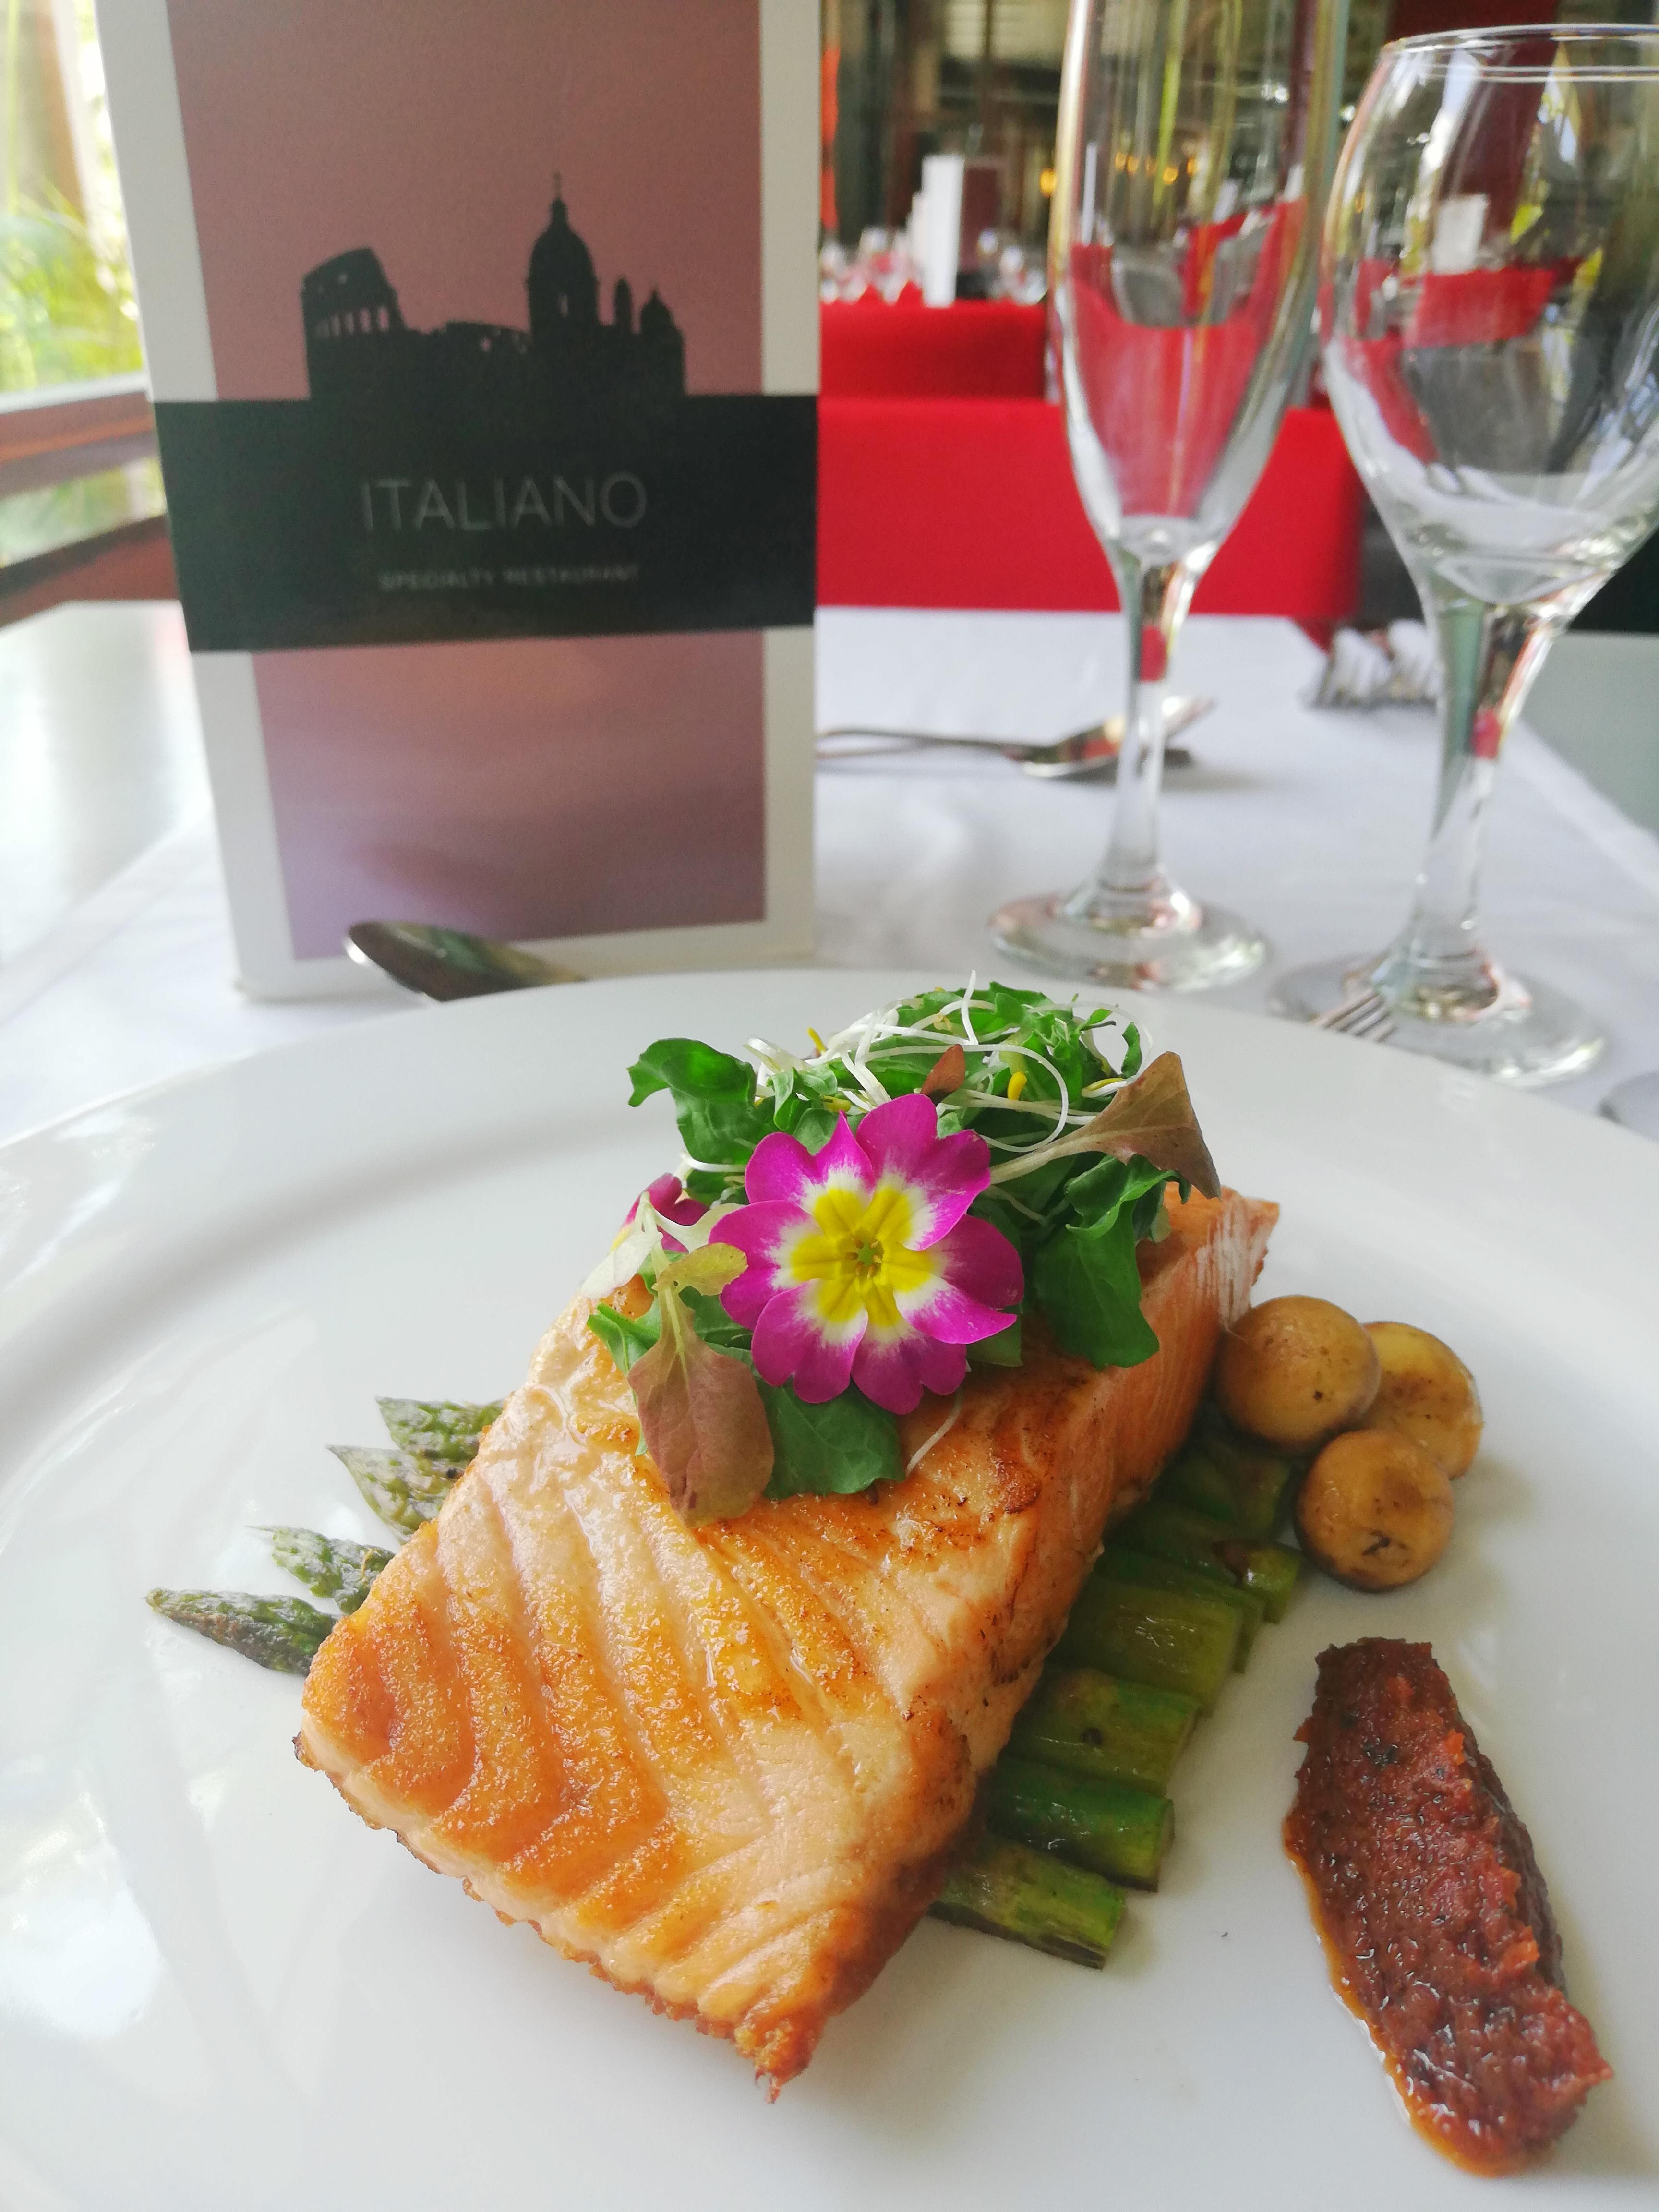 """Grilled Salmon Fillet"" at RIU"